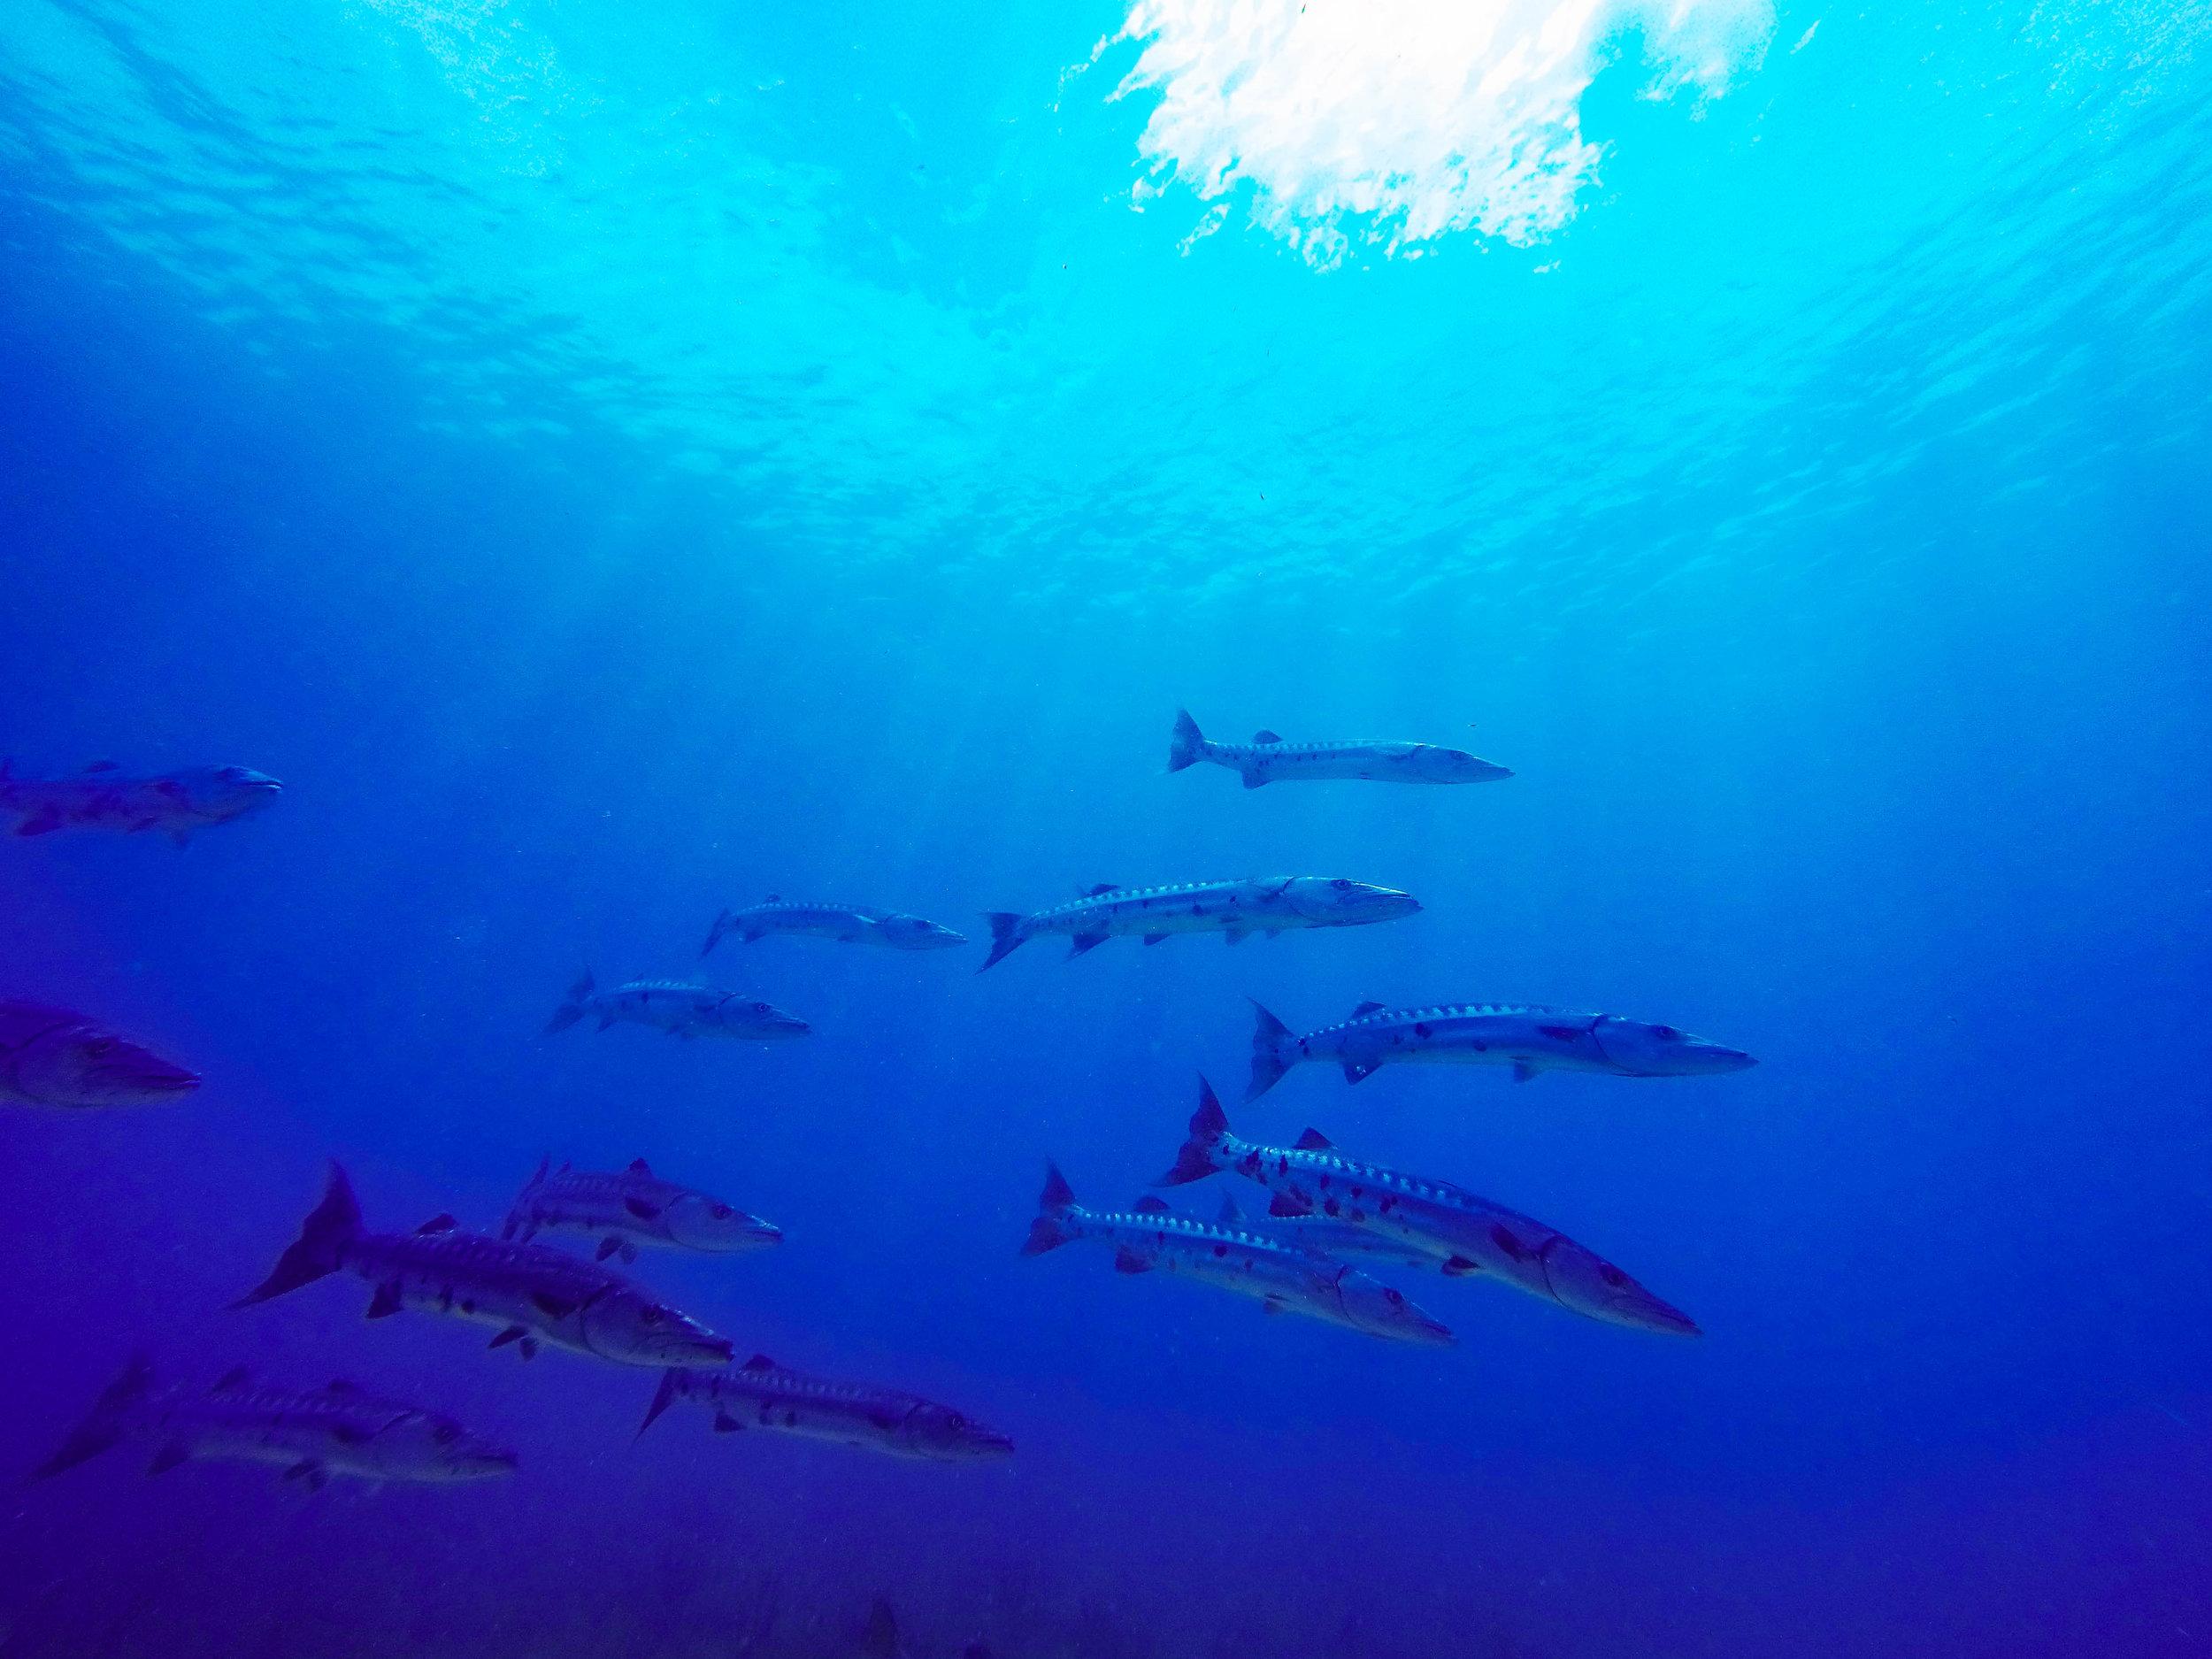 Anglers-Hotel-Reef-ve_steve-boxall-20150104_2825.jpg